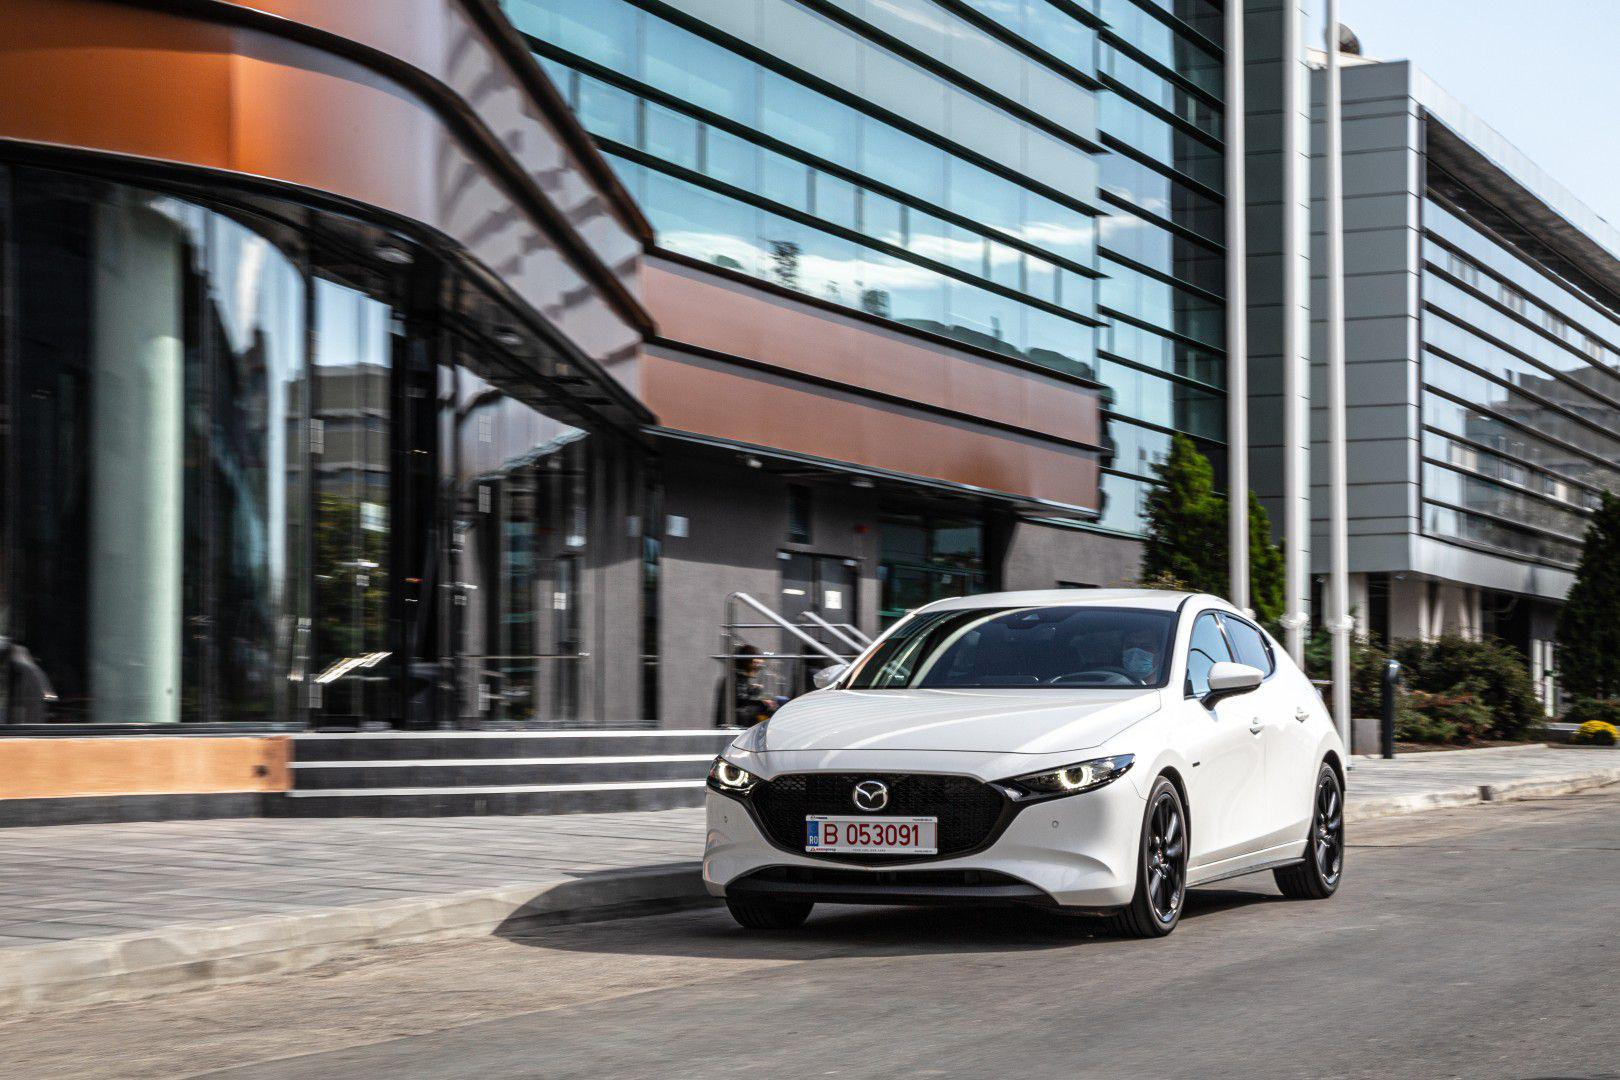 Mazda 3 Edition 100: Tortul centenar